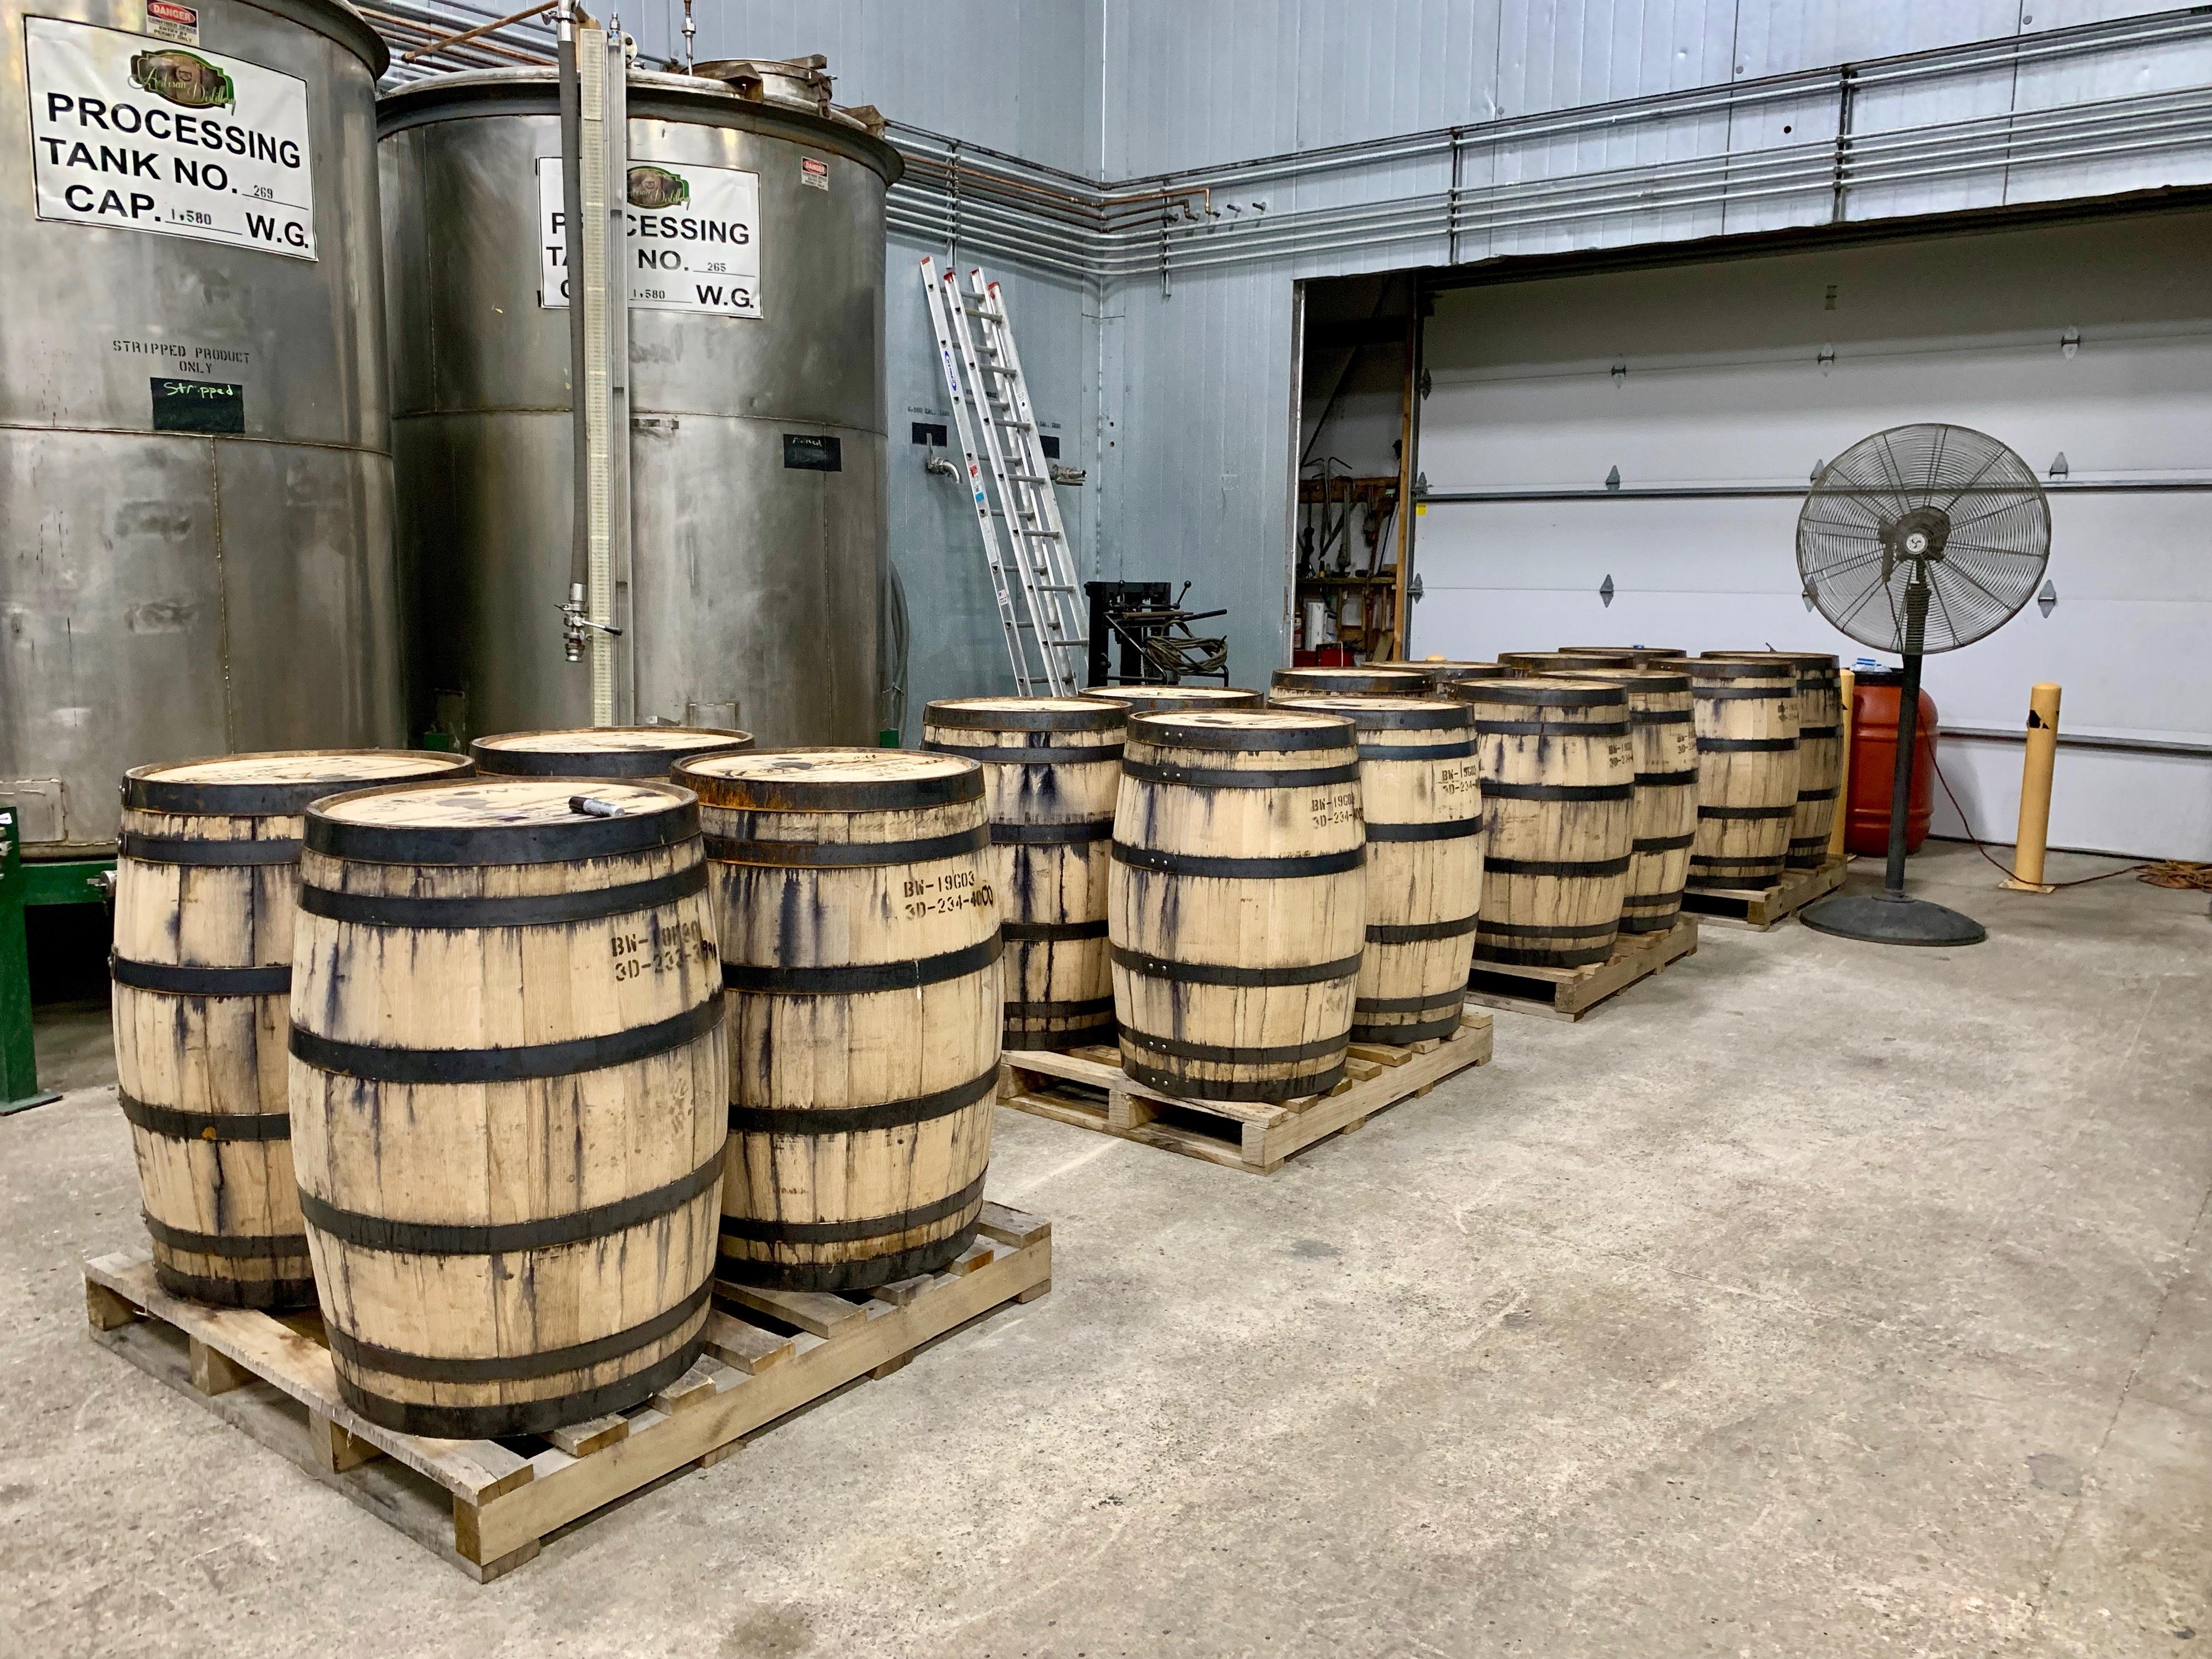 Freshly Filled Barrels - Kentucky Artisan Distillery